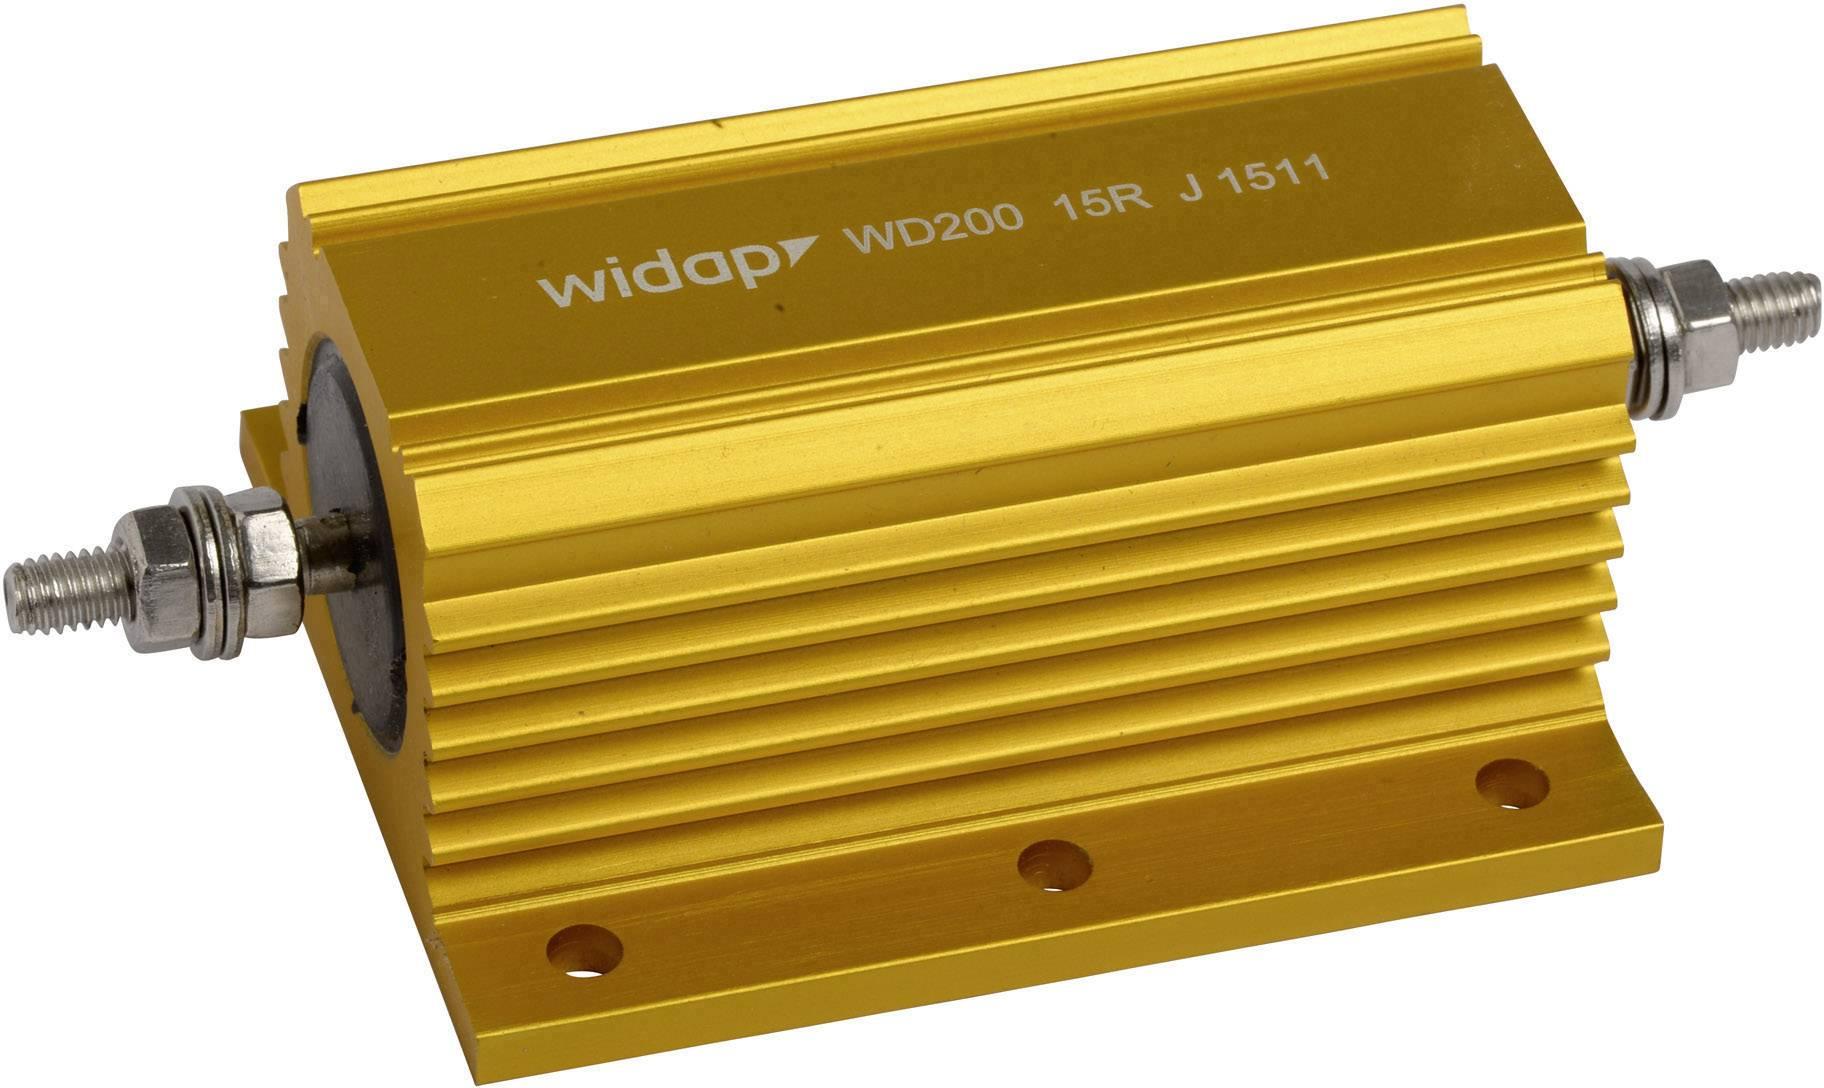 Drôtový rezistor Widap 160149, hodnota odporu 6.8 Ohm, 200 W, 1 ks